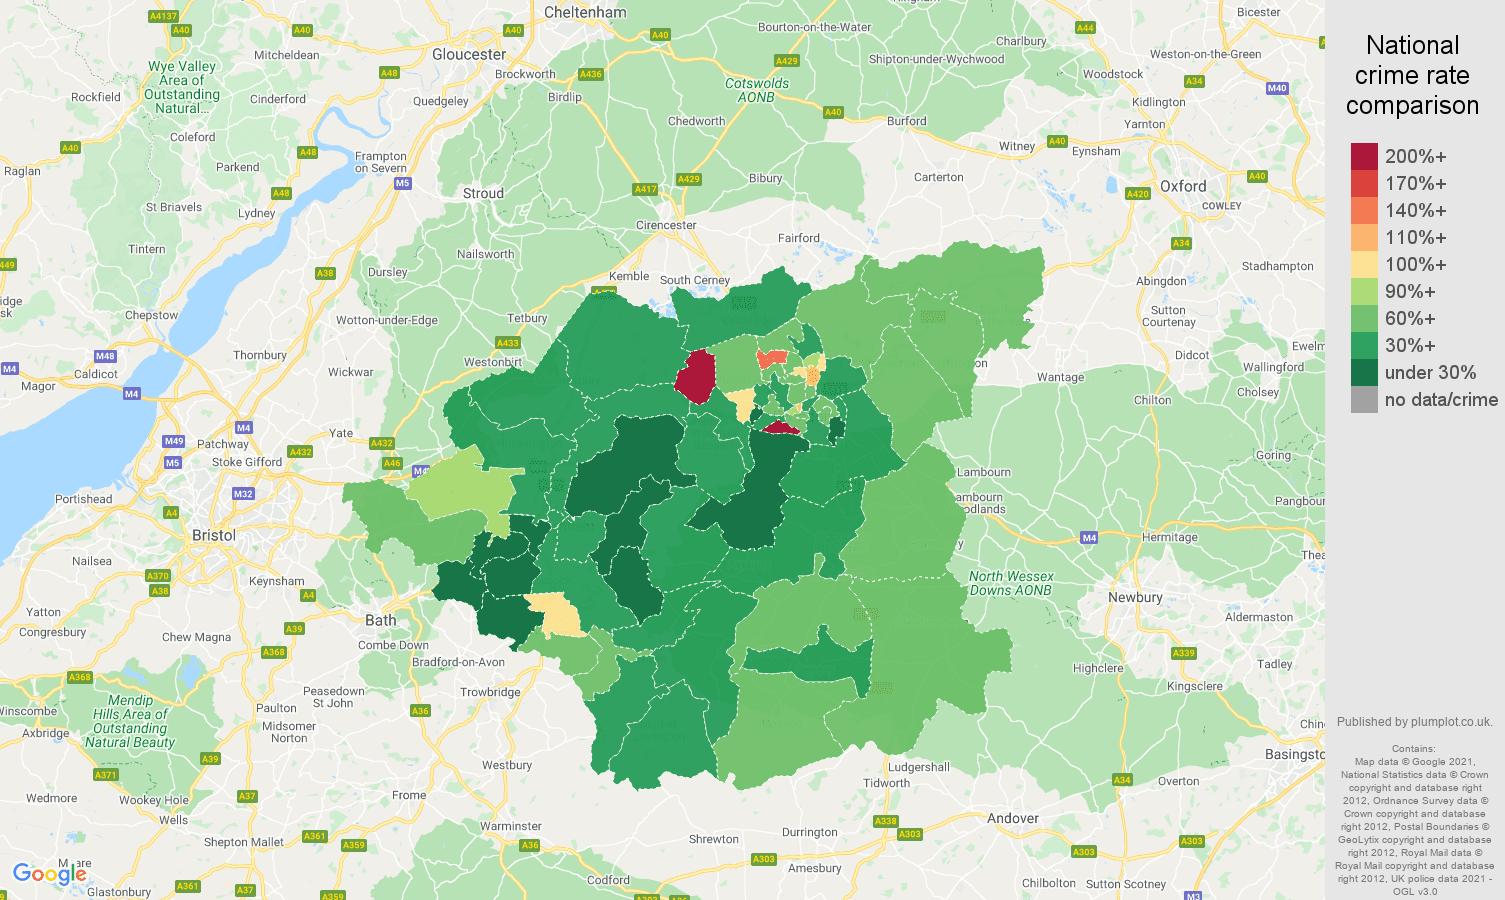 Swindon burglary crime rate comparison map